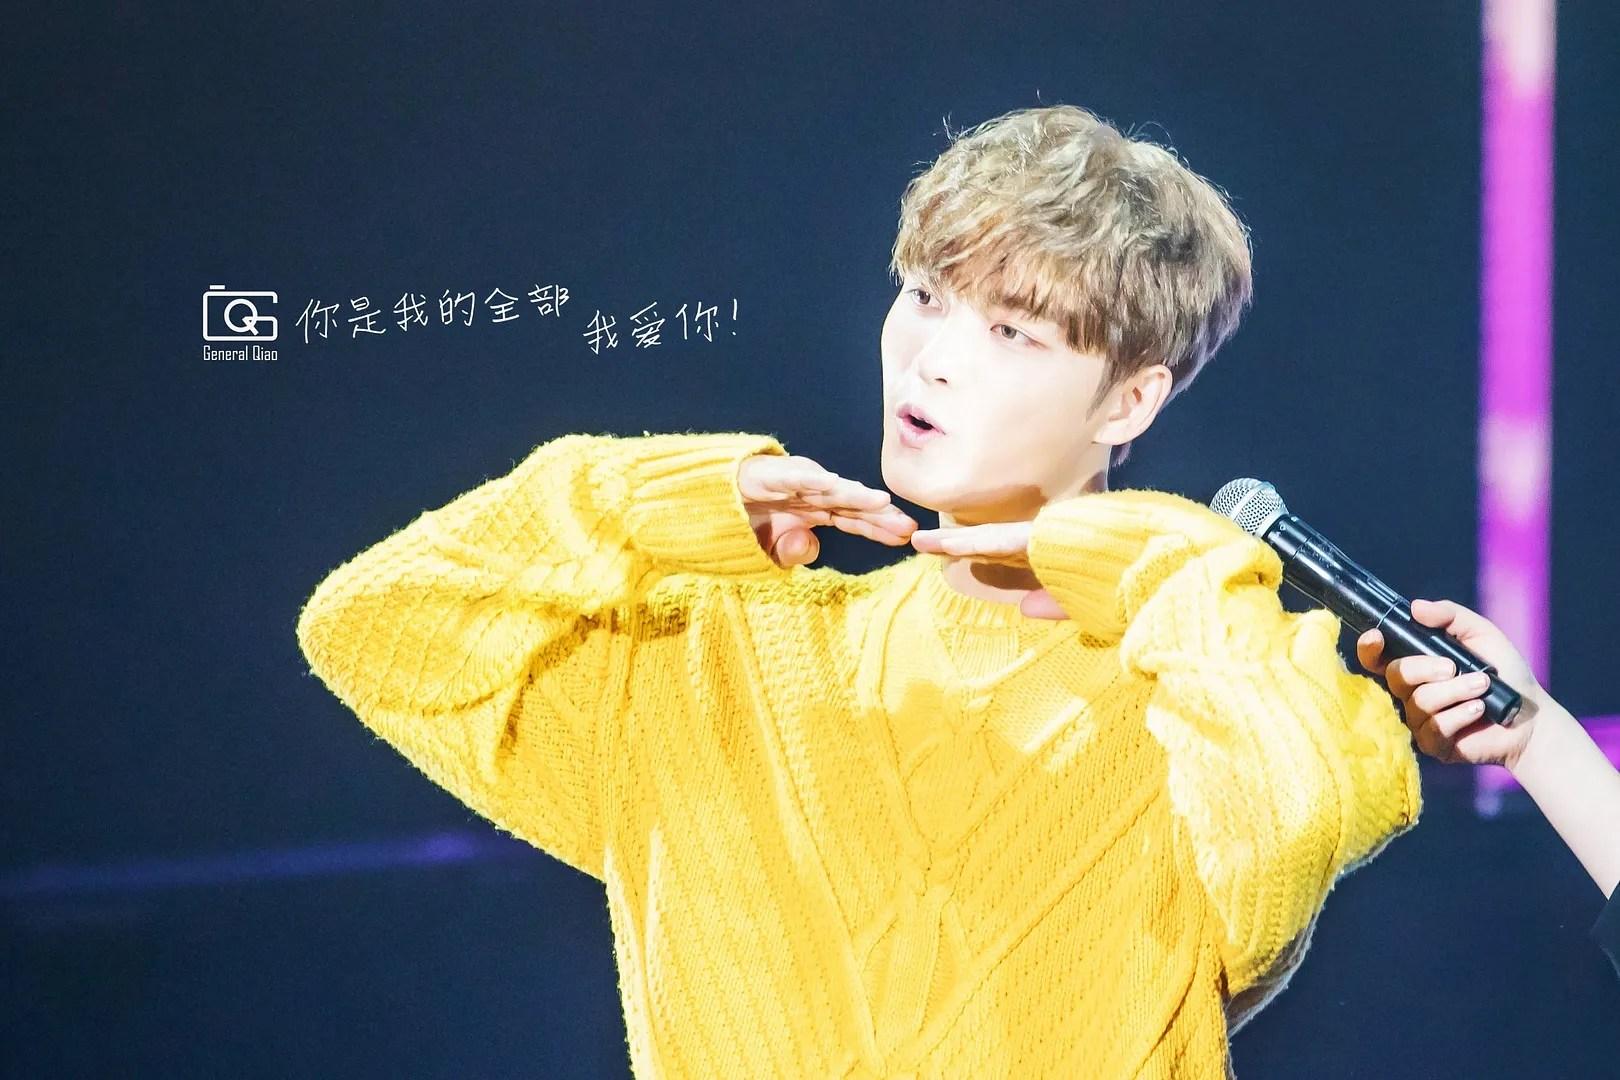 photo General_Qiao_18.jpg